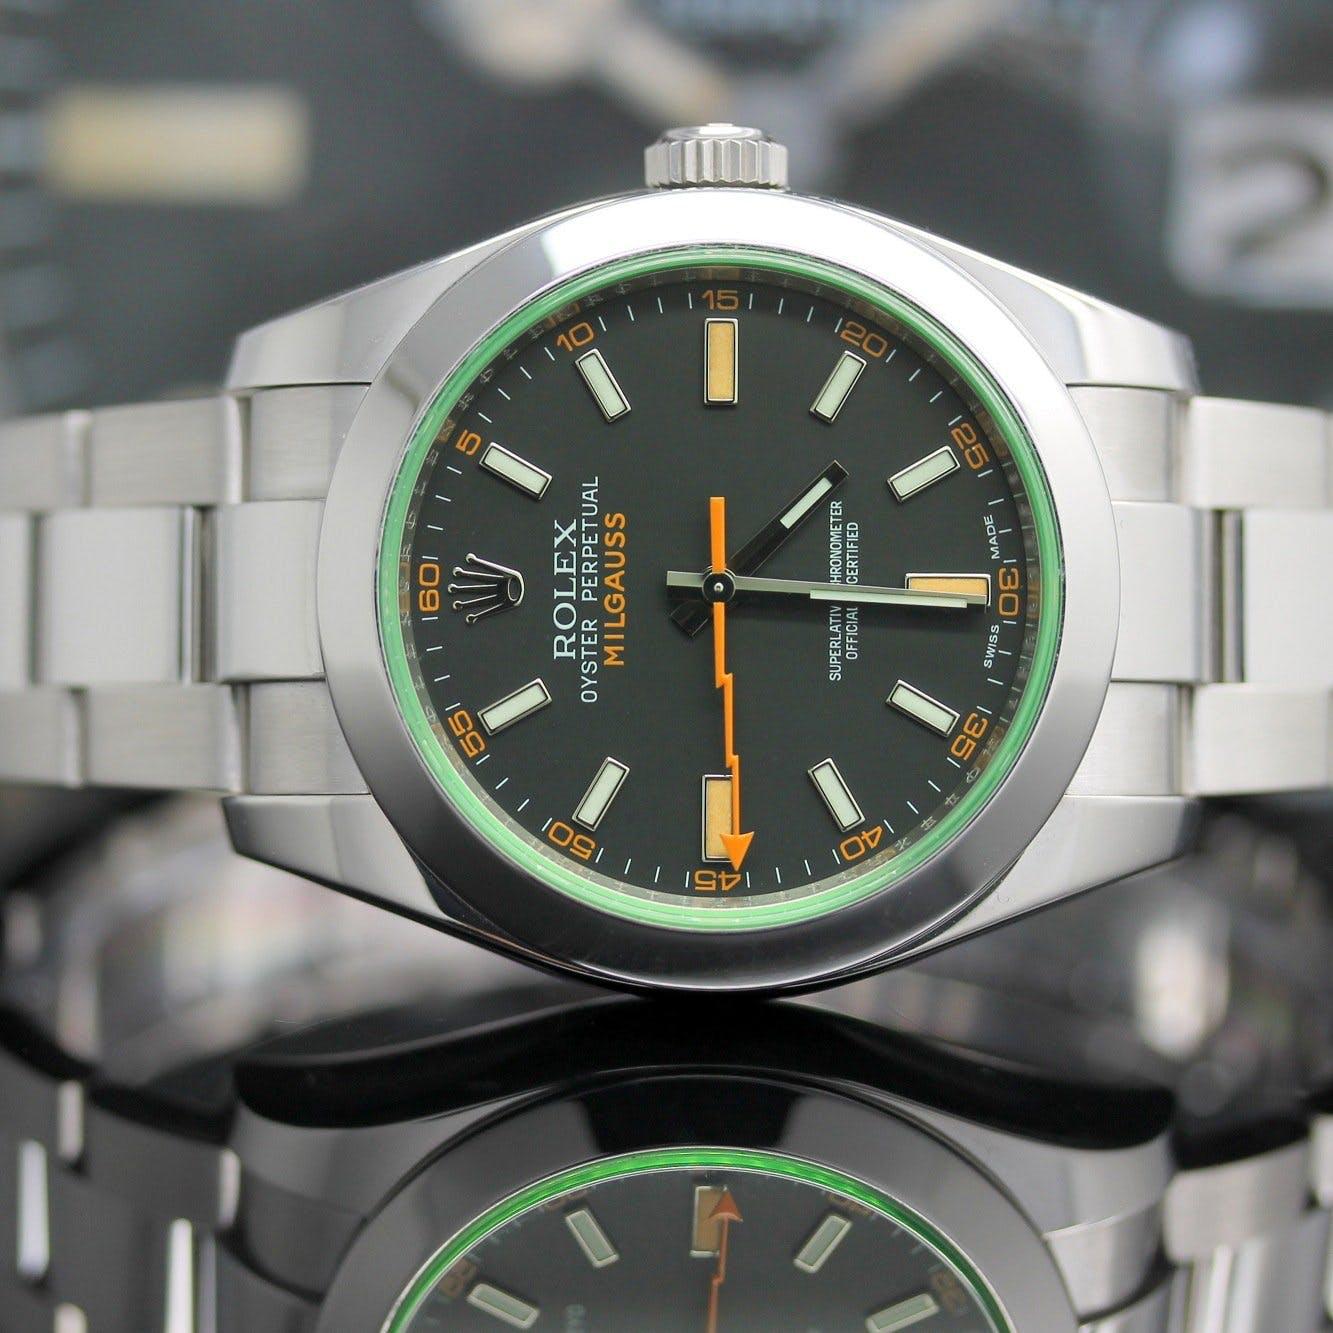 Rolex Milgauss réf. 116400GV